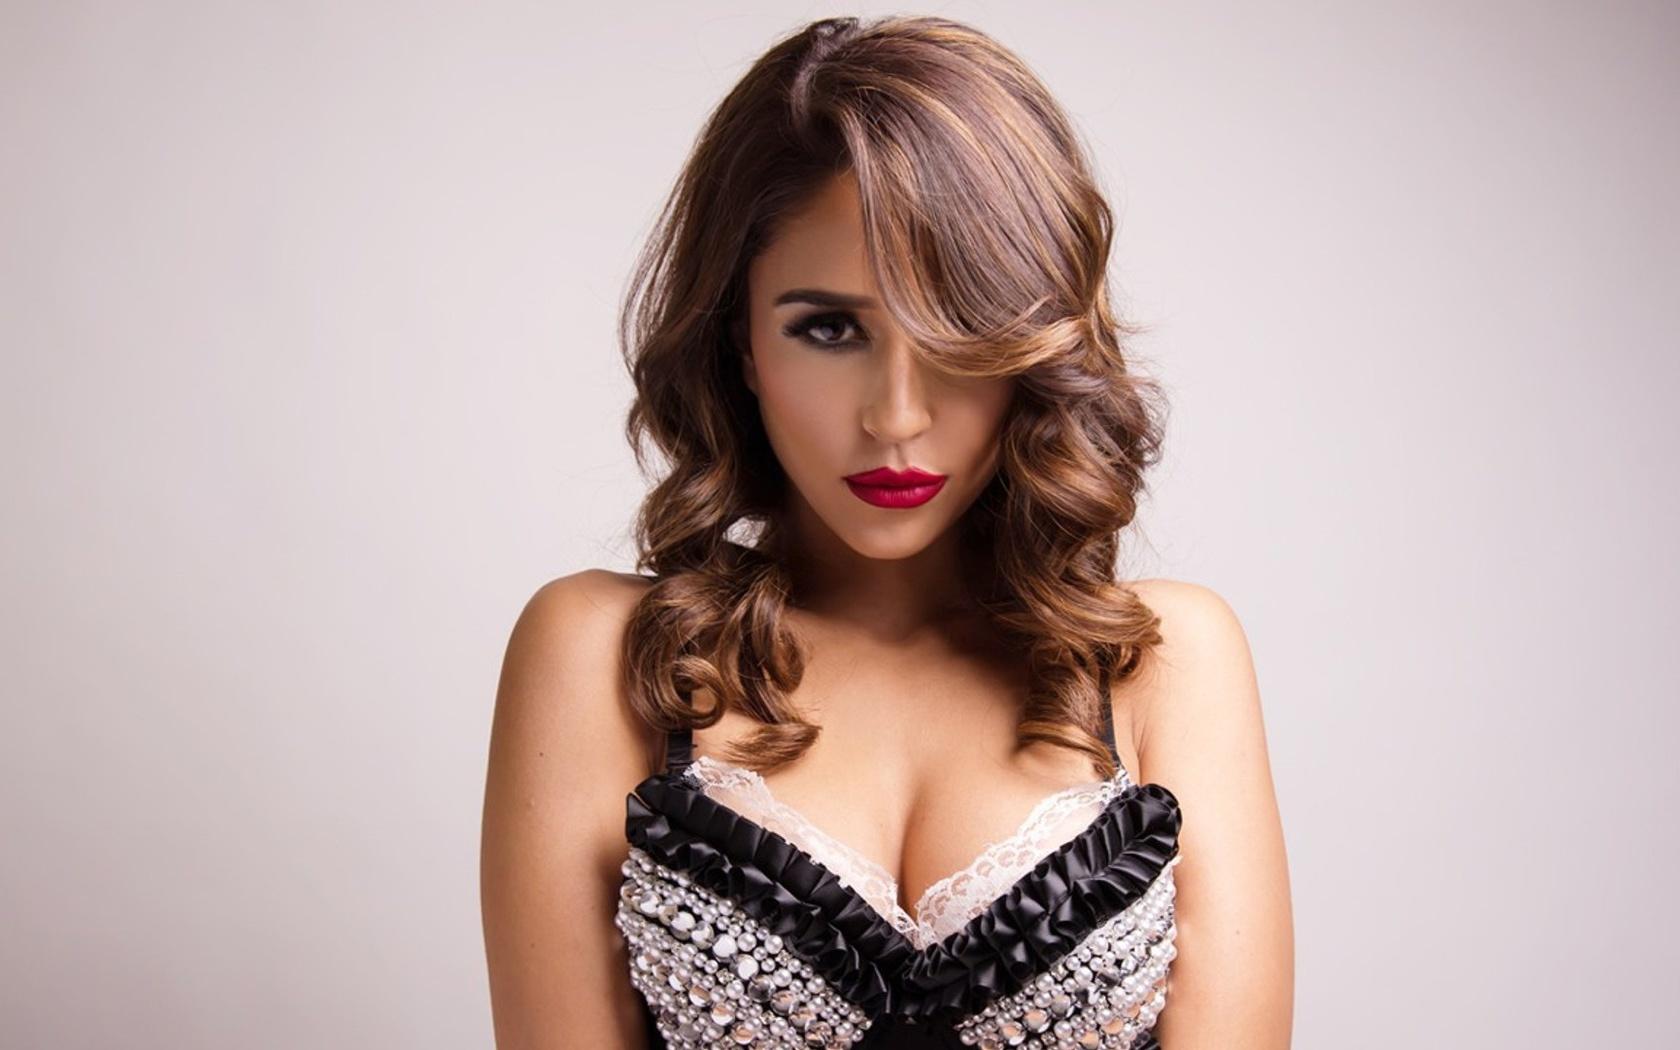 hot-pretty-woman-prriod